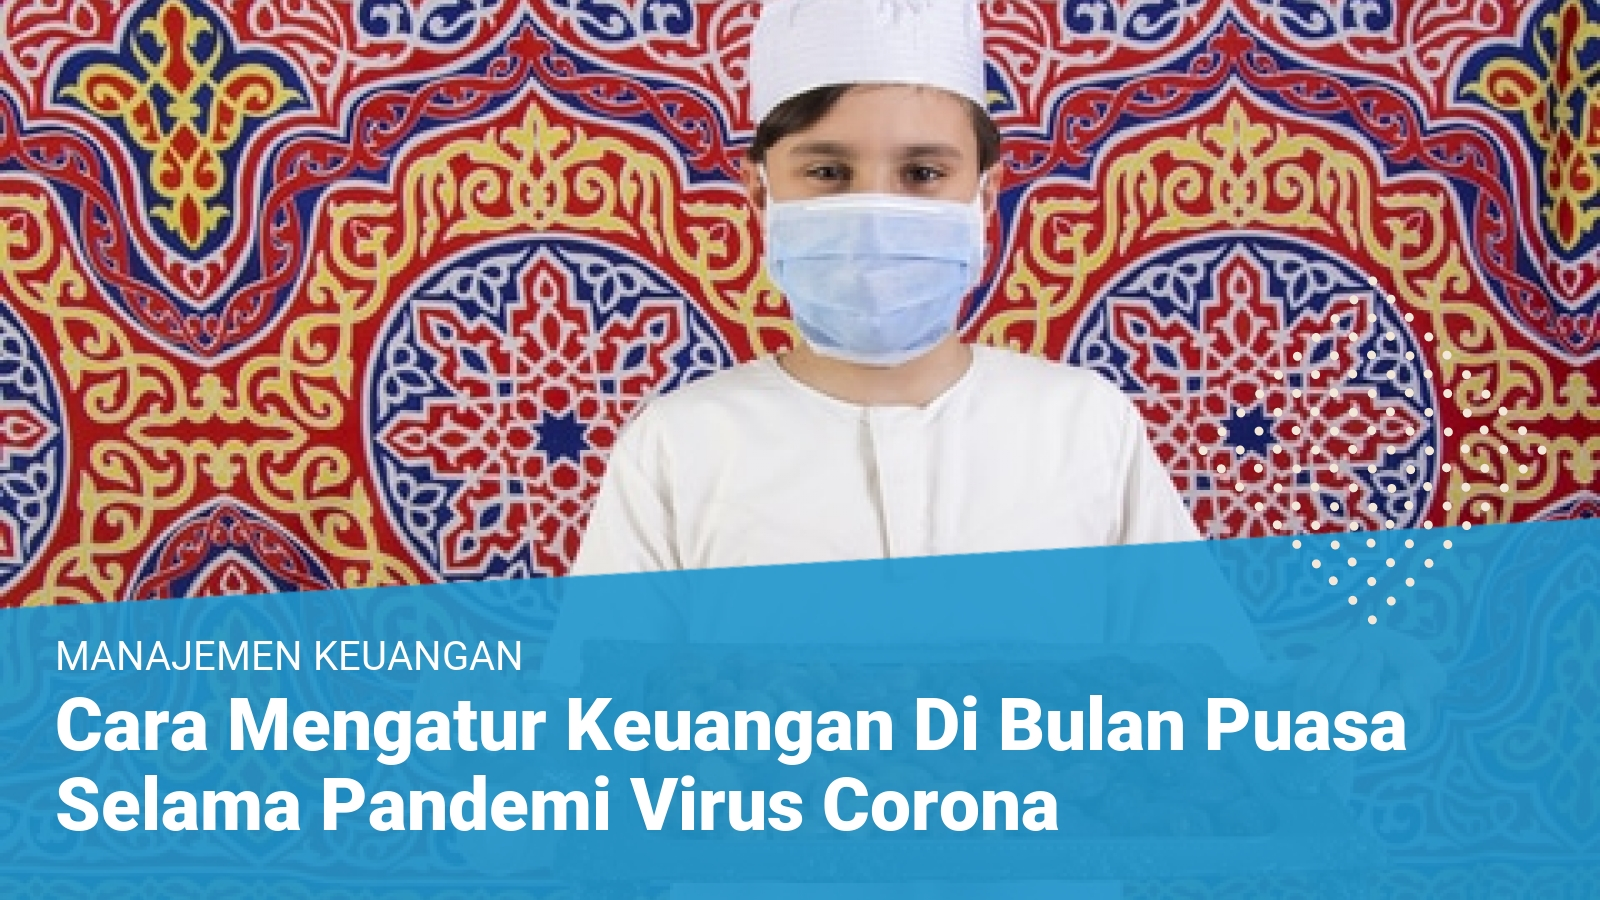 Cara Mengatur Keuangan Di Bulan Puasa Selama Pandemi Virus Corona